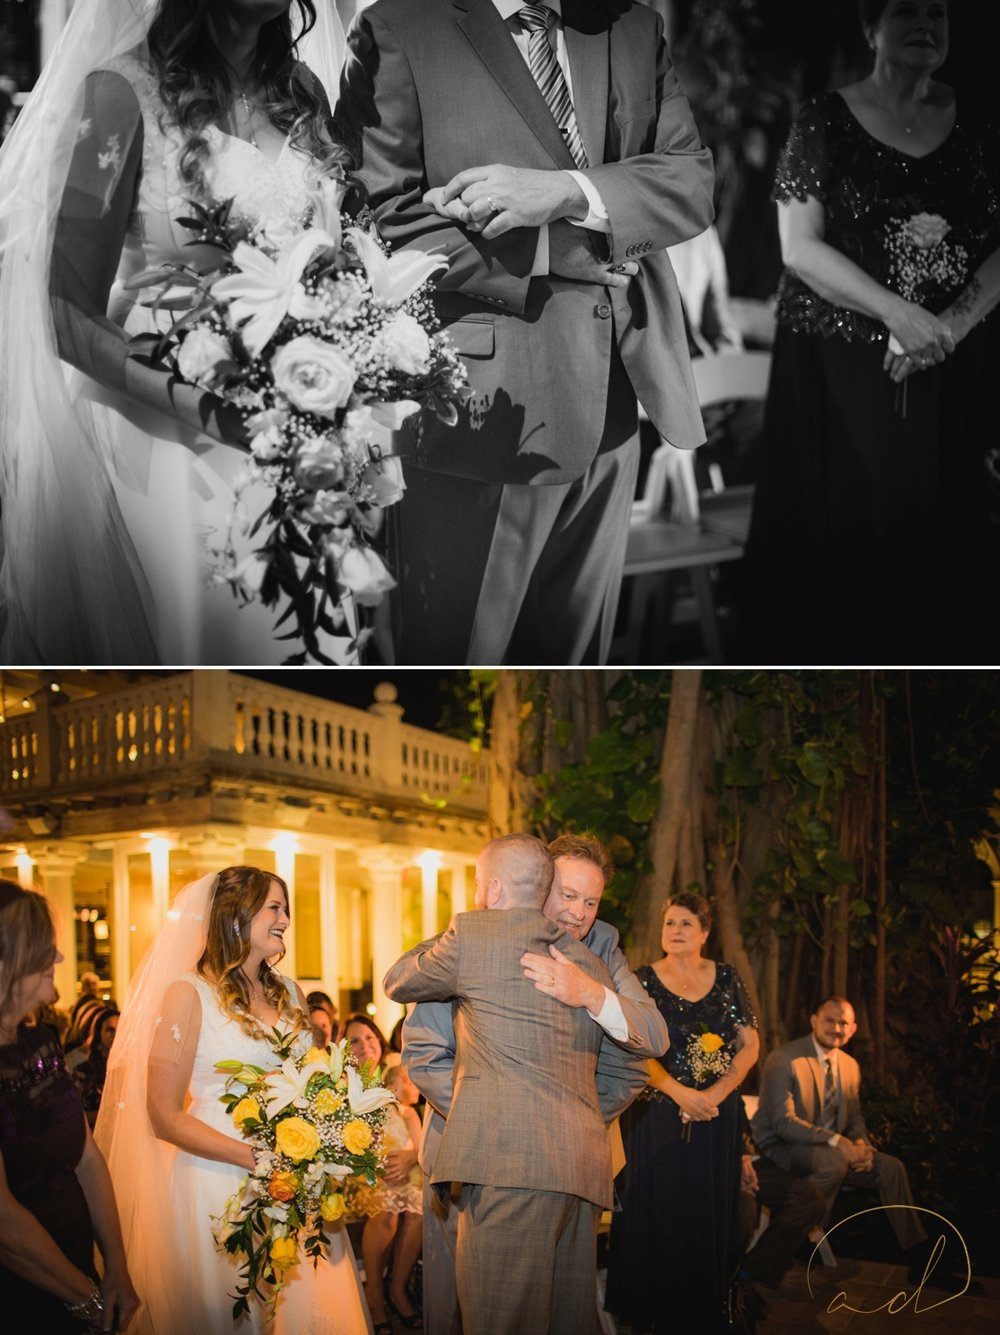 Emma Drew Addison Wedding Documentary Beach First Look Hillsboro Night Ohio State Fall November Florida Best Photographer 25.jpg